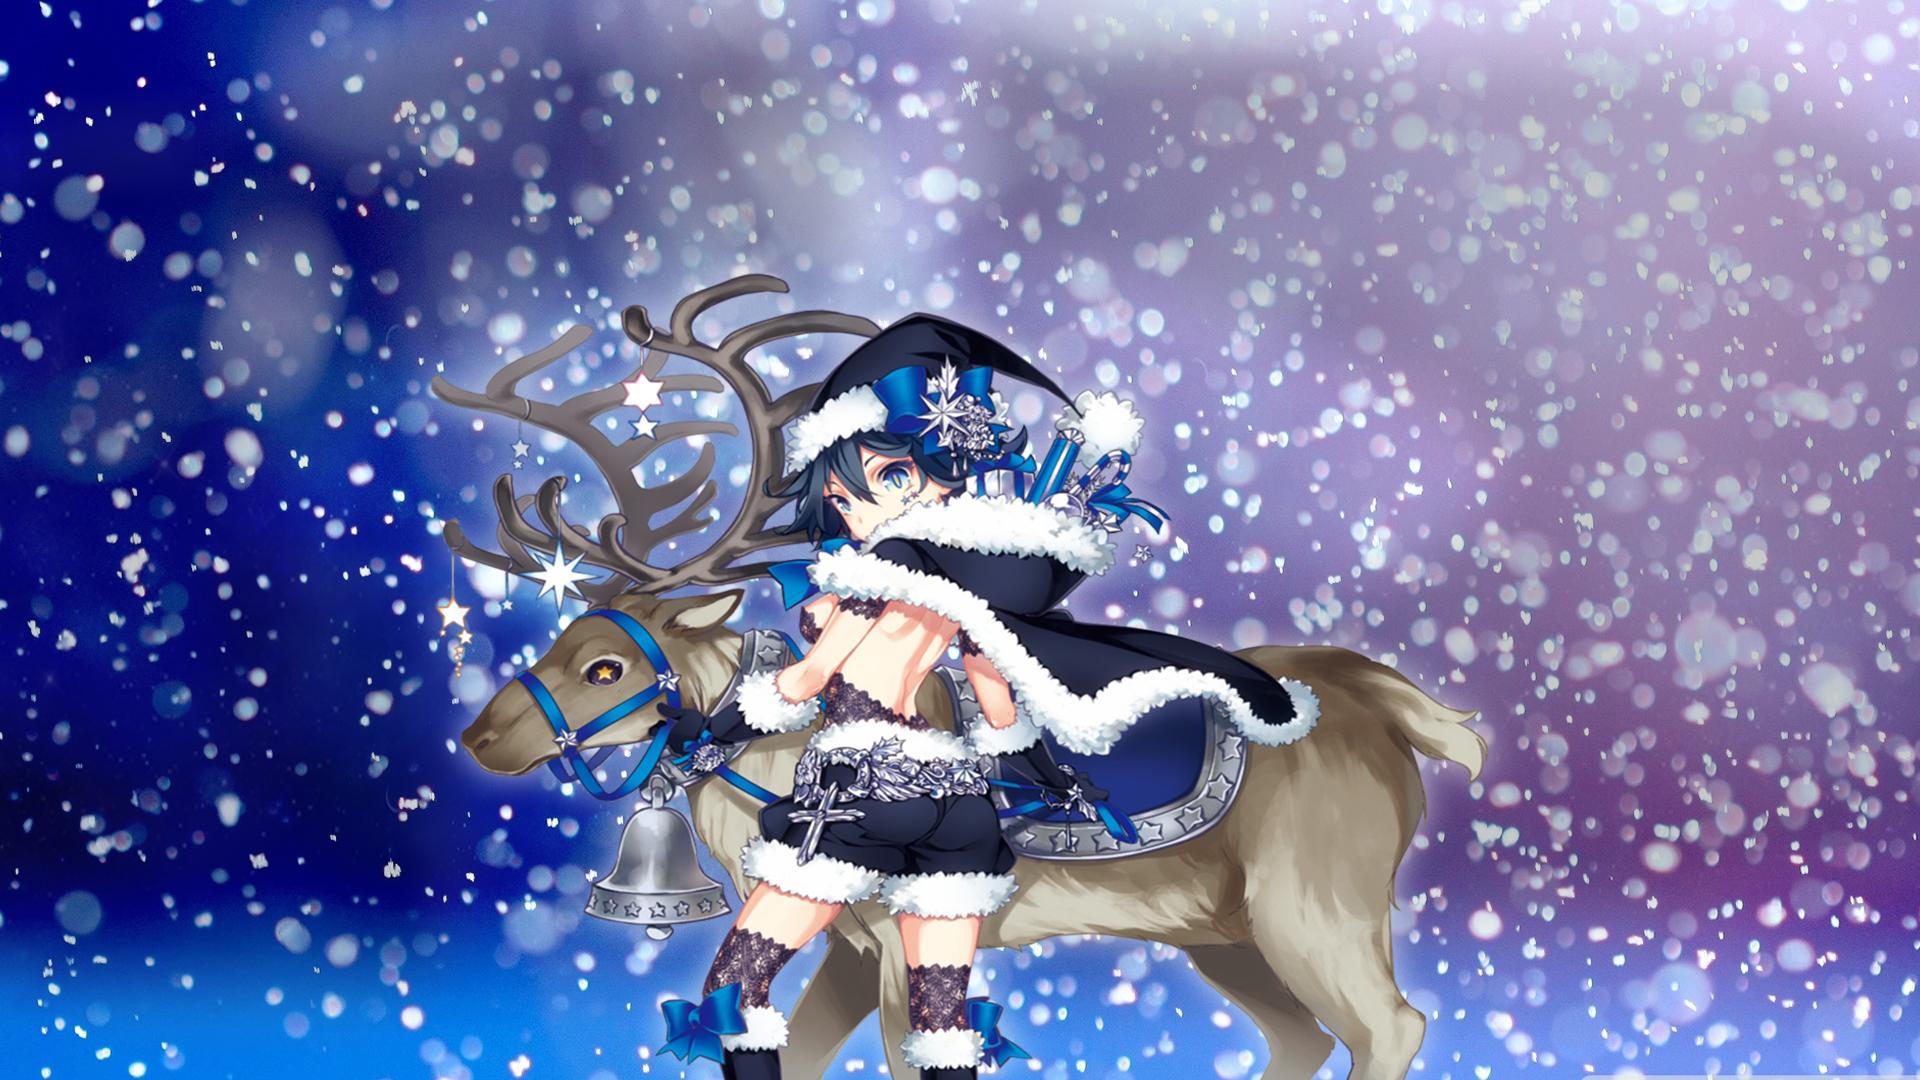 Anime Christmas Wallpaper.Blue Anime Girl Christmas Wallpaper By Callmeteddy24 On